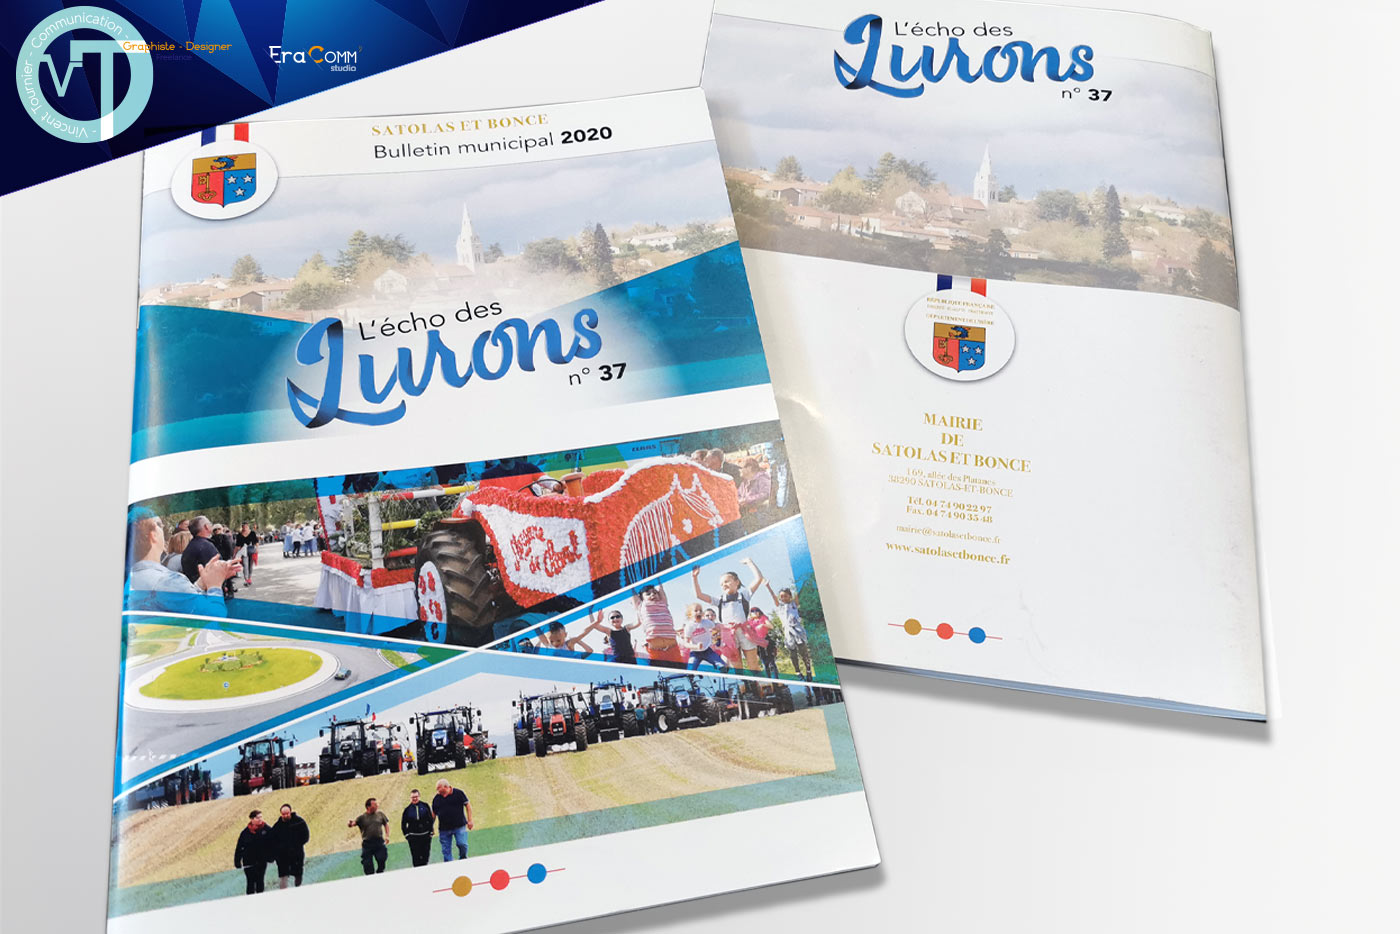 Bulletin-Municipal_Satolas-et-Bonce_VT-Communication